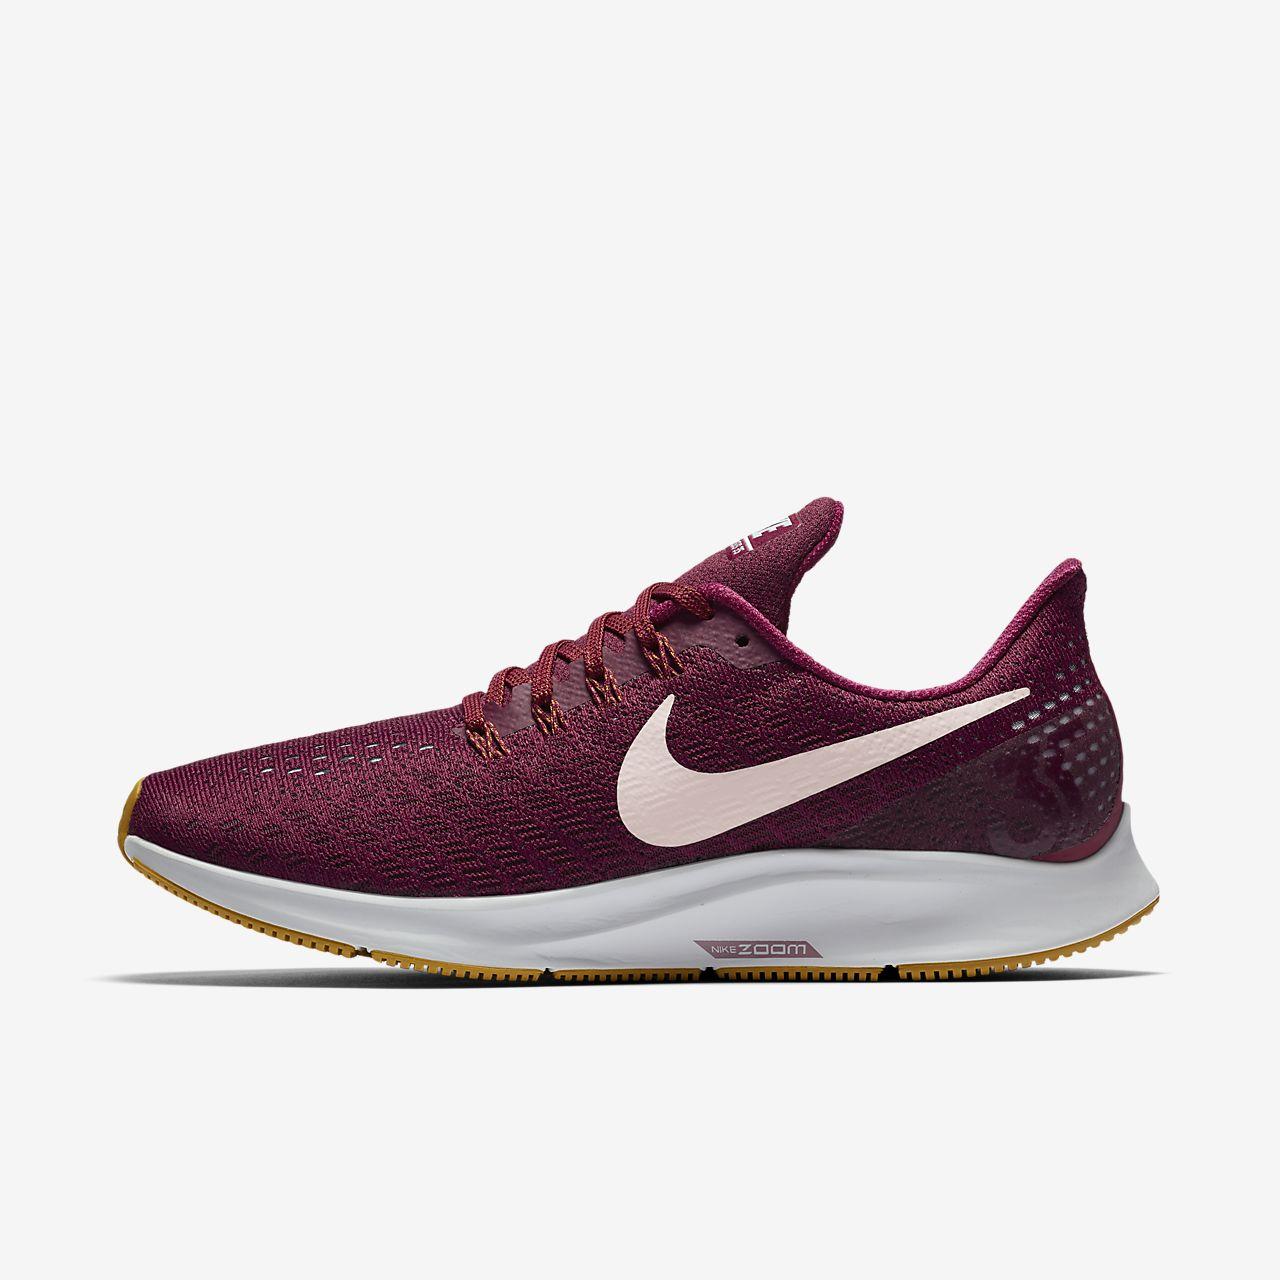 3d32967d3a559c Nike Air Zoom Pegasus 35 Women s Running Shoe. Nike.com